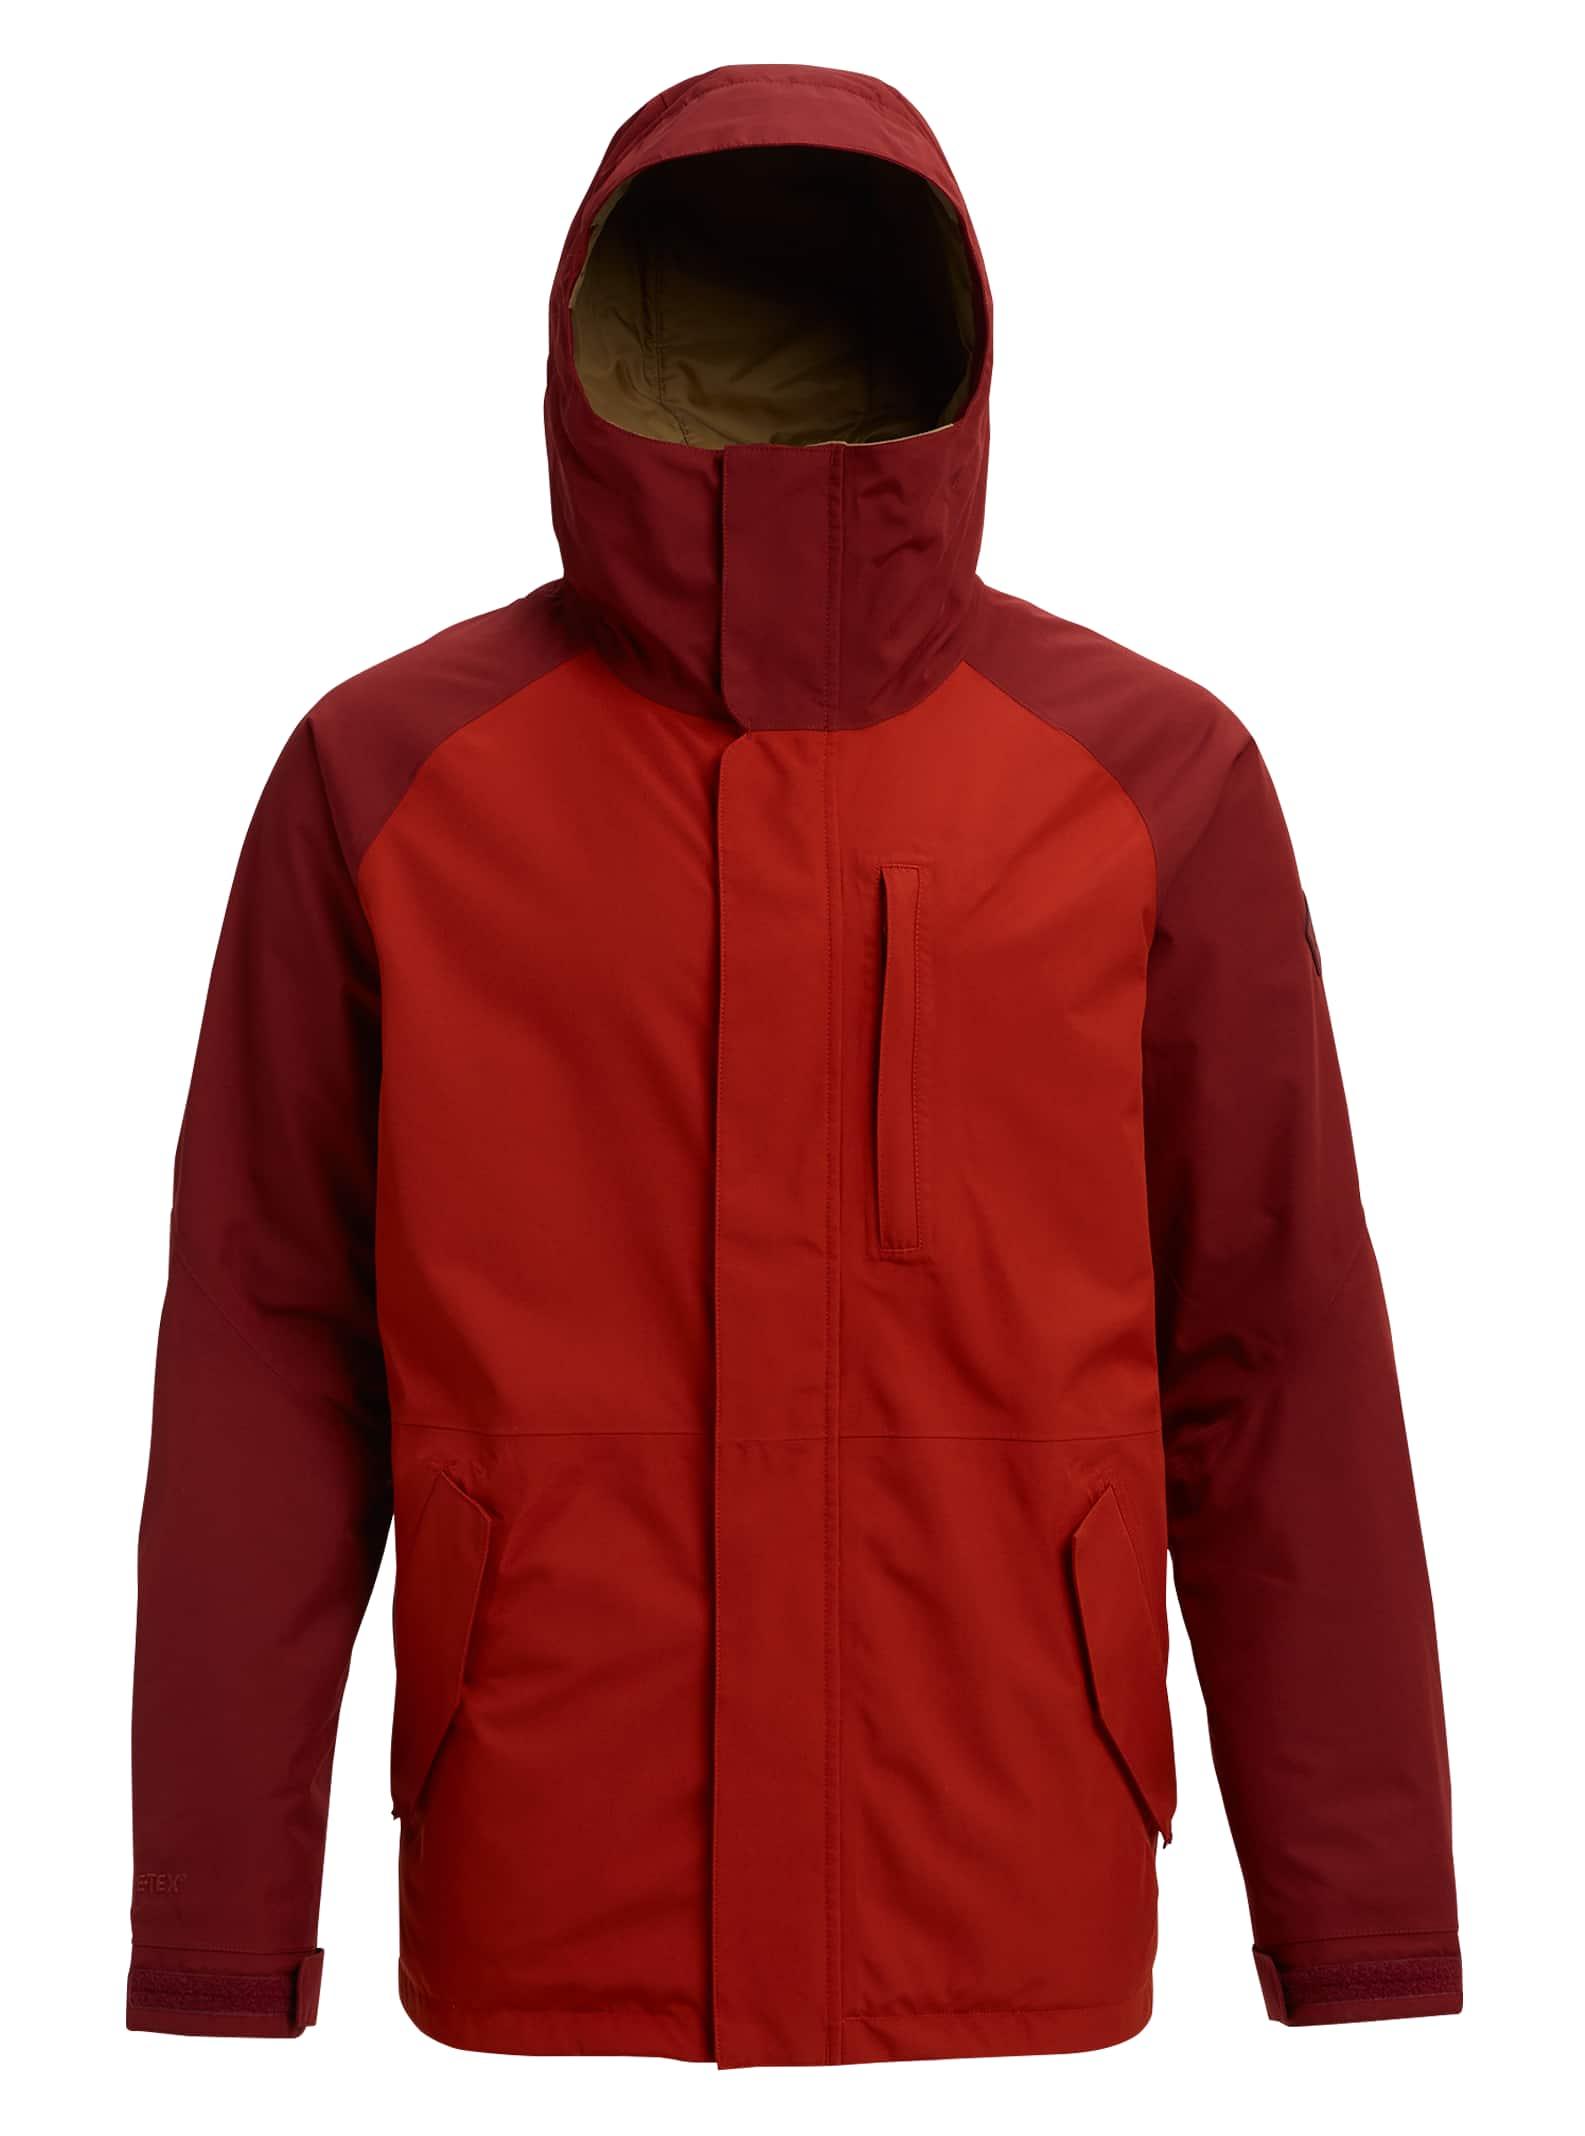 807573dc8d8d9 Men s Snowboard Jackets